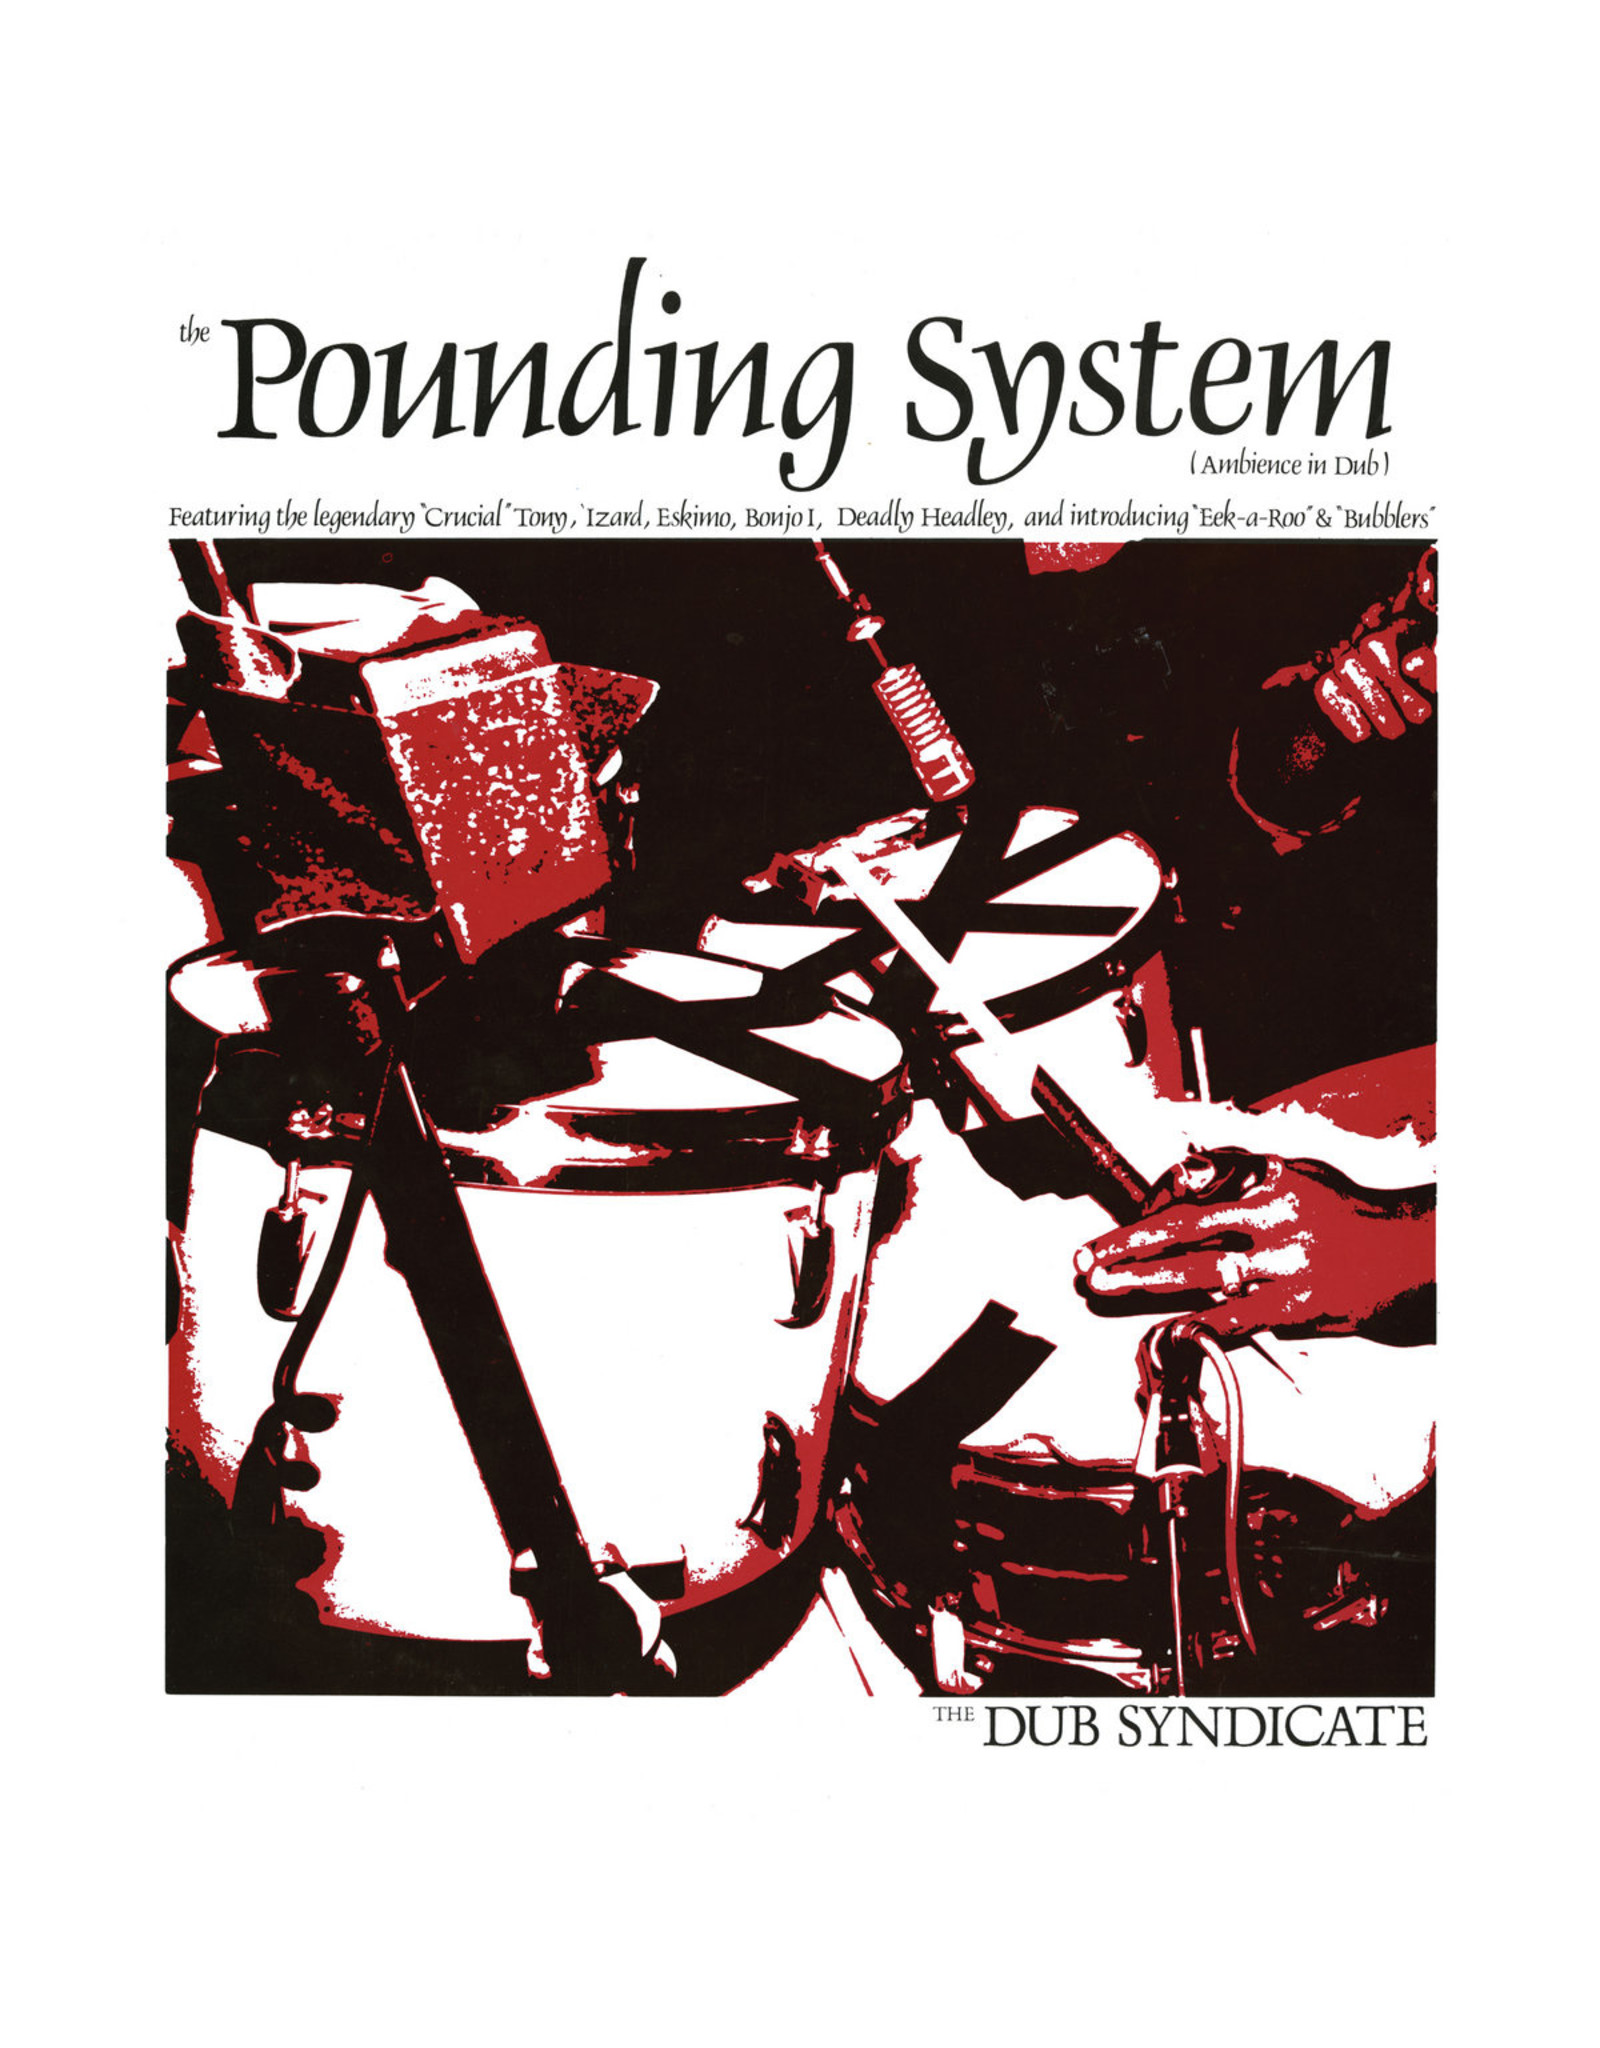 New Vinyl Dub Syndicate - The Pounding System LP